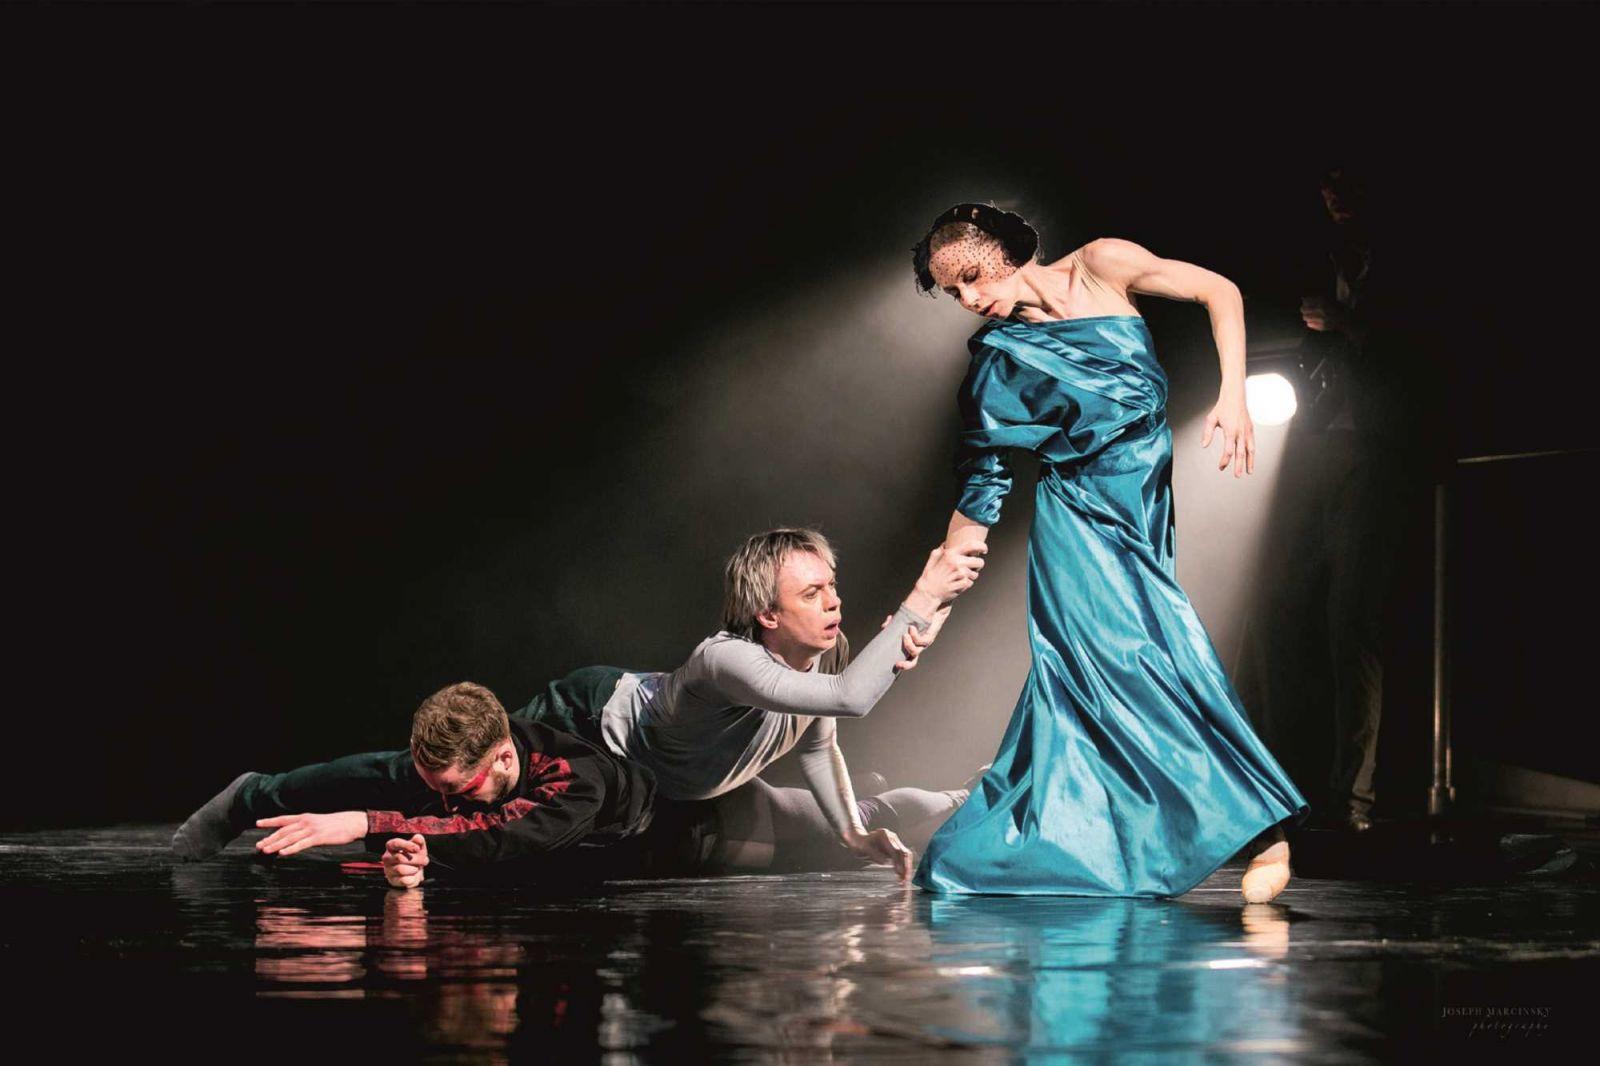 V košickom divadle ožije v novom balete príbeh Rudolfa Nurejeva